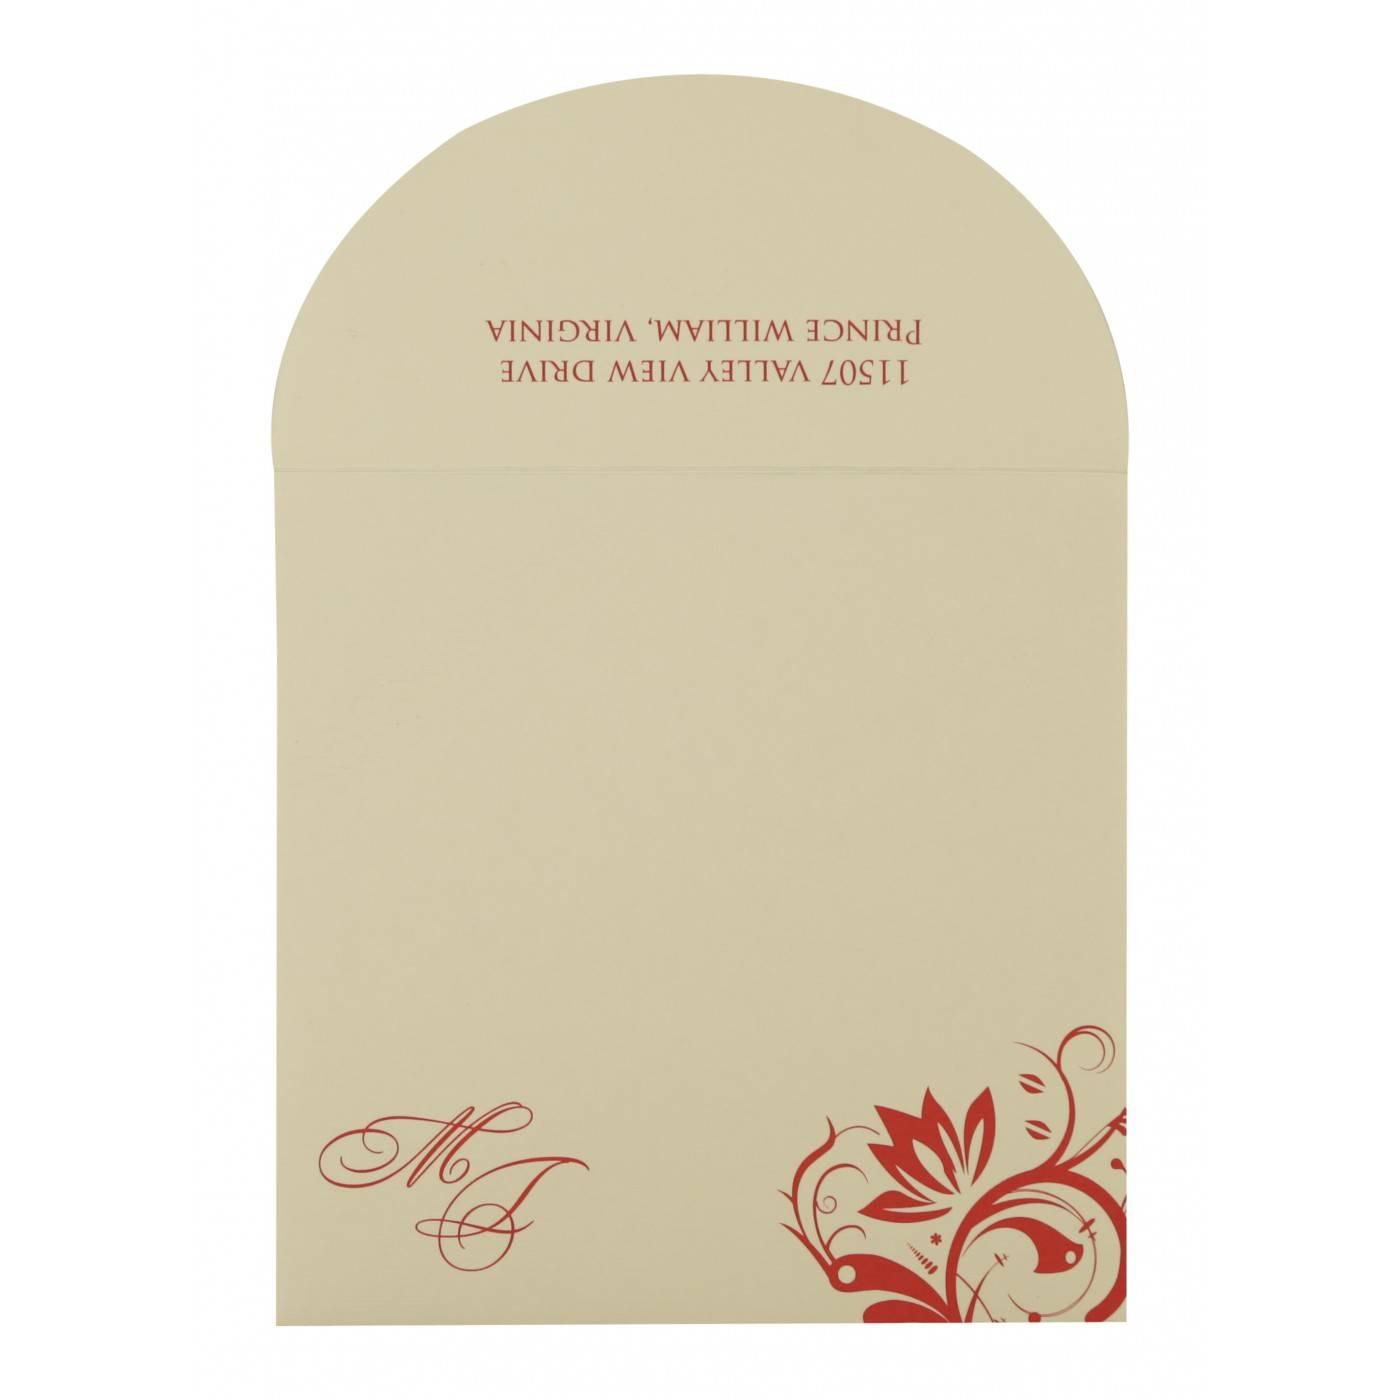 DARK RED MATTE PAISLEY THEMED - SCREEN PRINTED WEDDING CARD : CRU-8264D - IndianWeddingCards